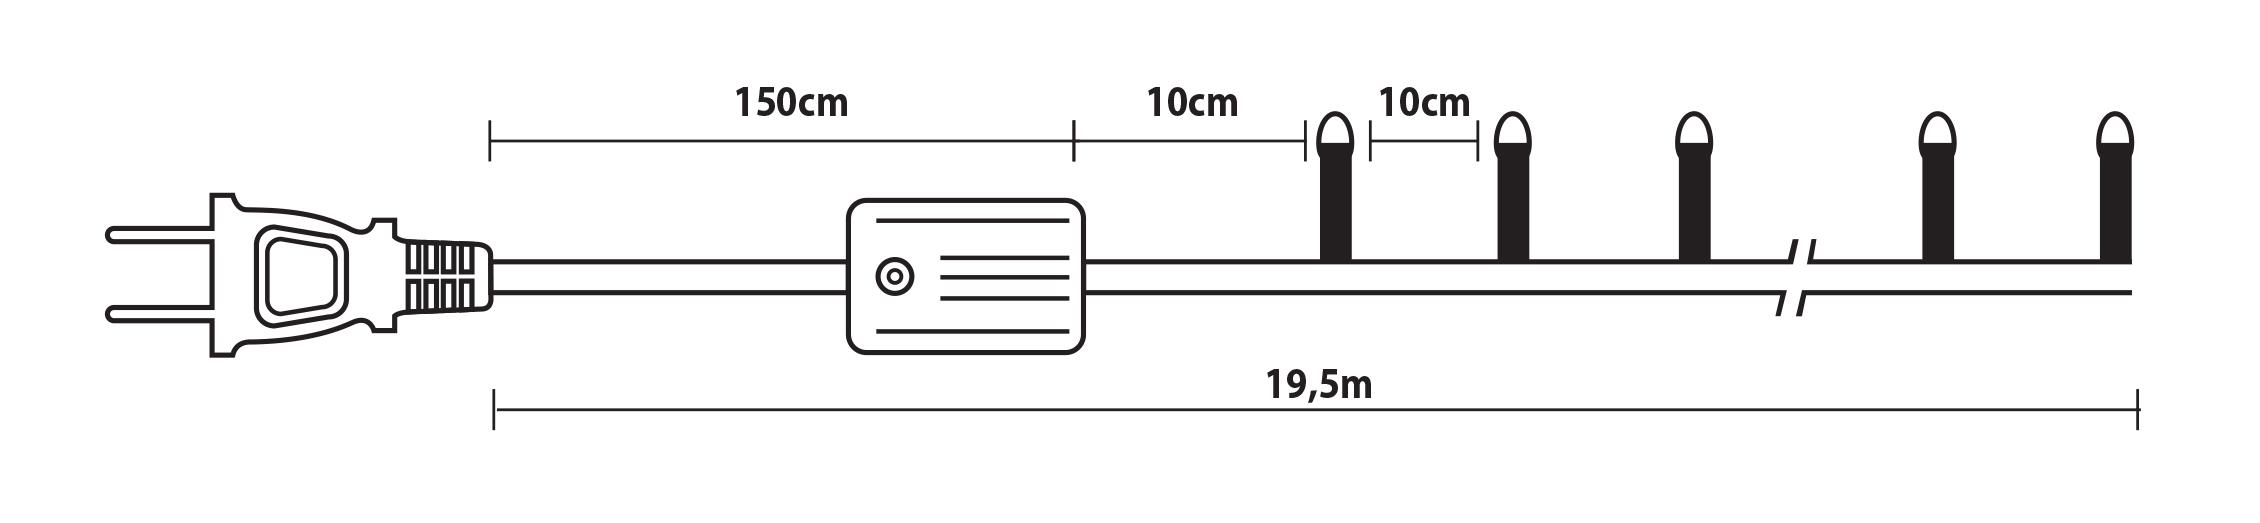 180L GS Λαμπάκια Με Επέκταση Και Πρόγραμμα  ,Πράσινο Καλώδιο/Θερμό Λαμπάκι , 19,5 Μέτρα